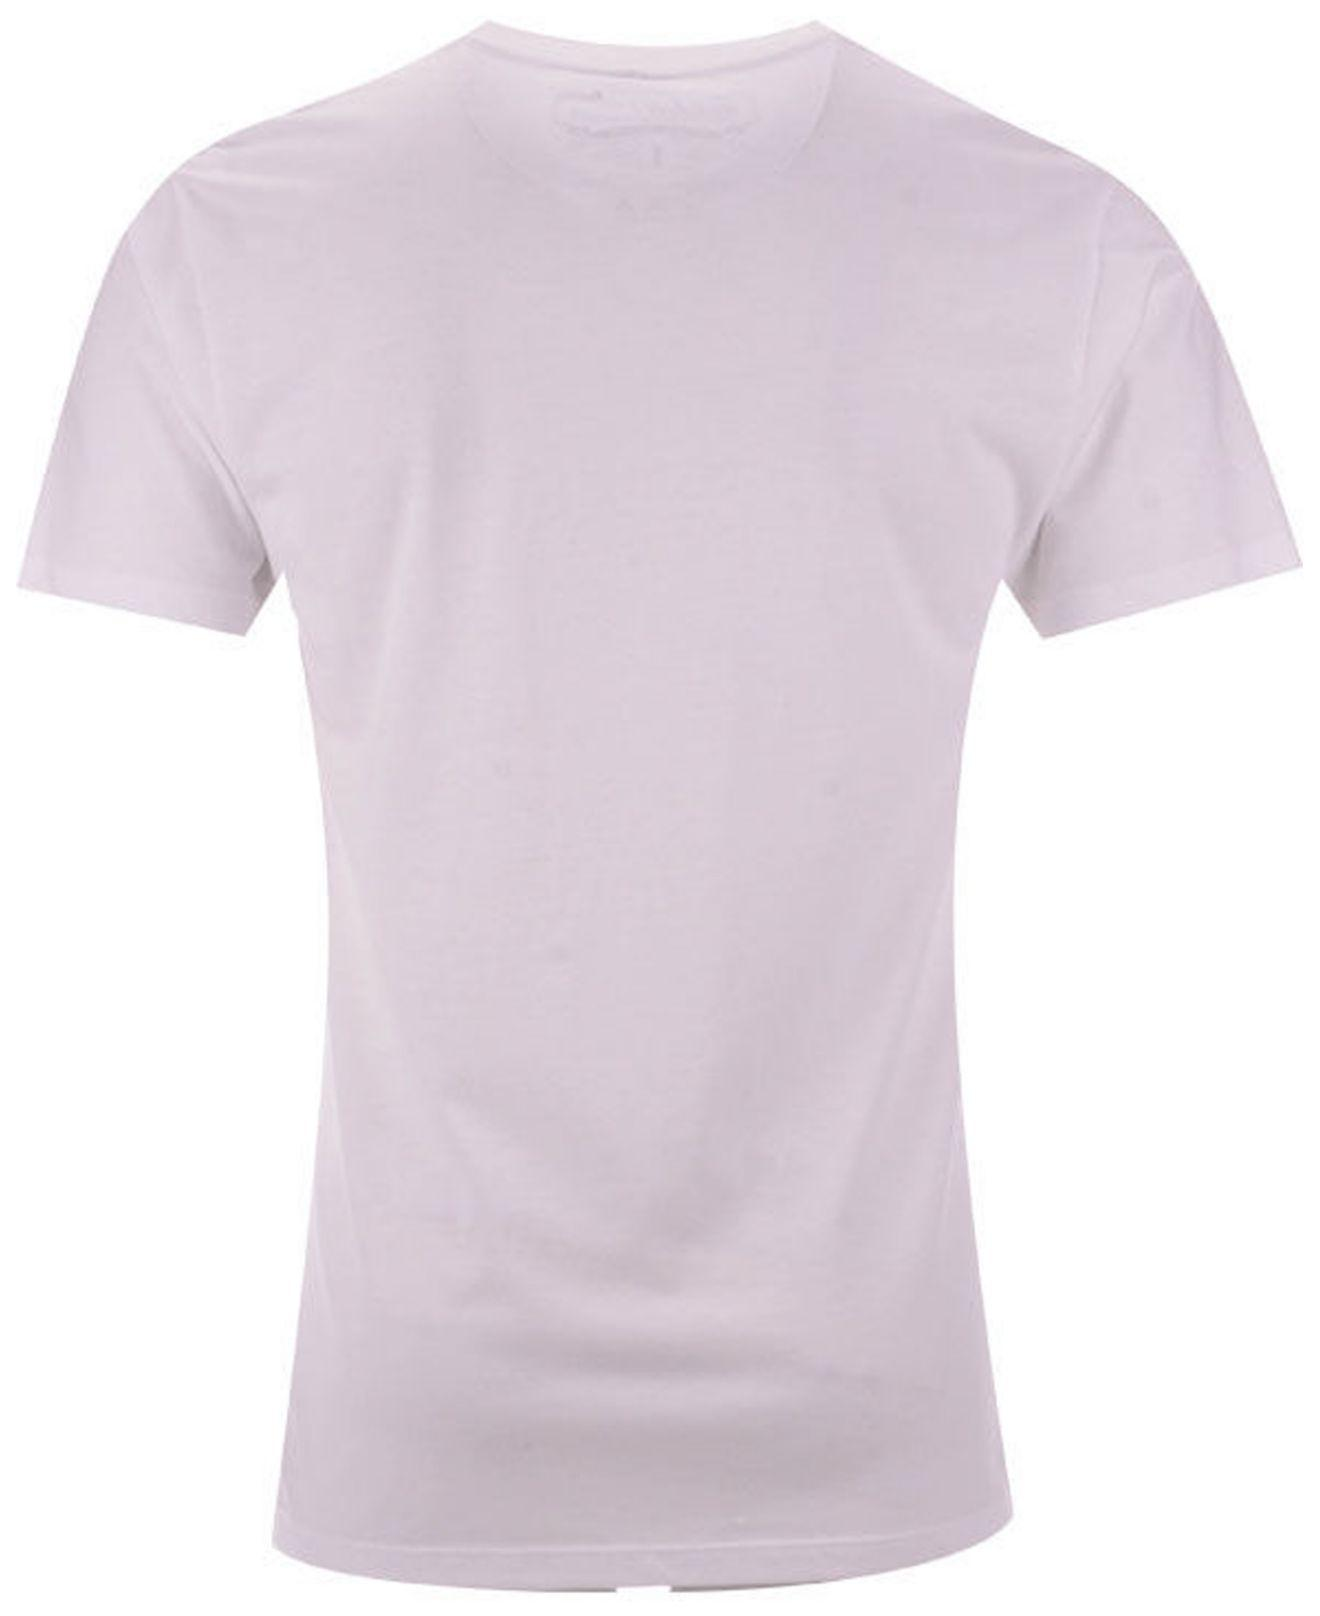 e19b9d65 Mitchell & Ness White Chicago Bulls 6 Time Gold T-shirt for men